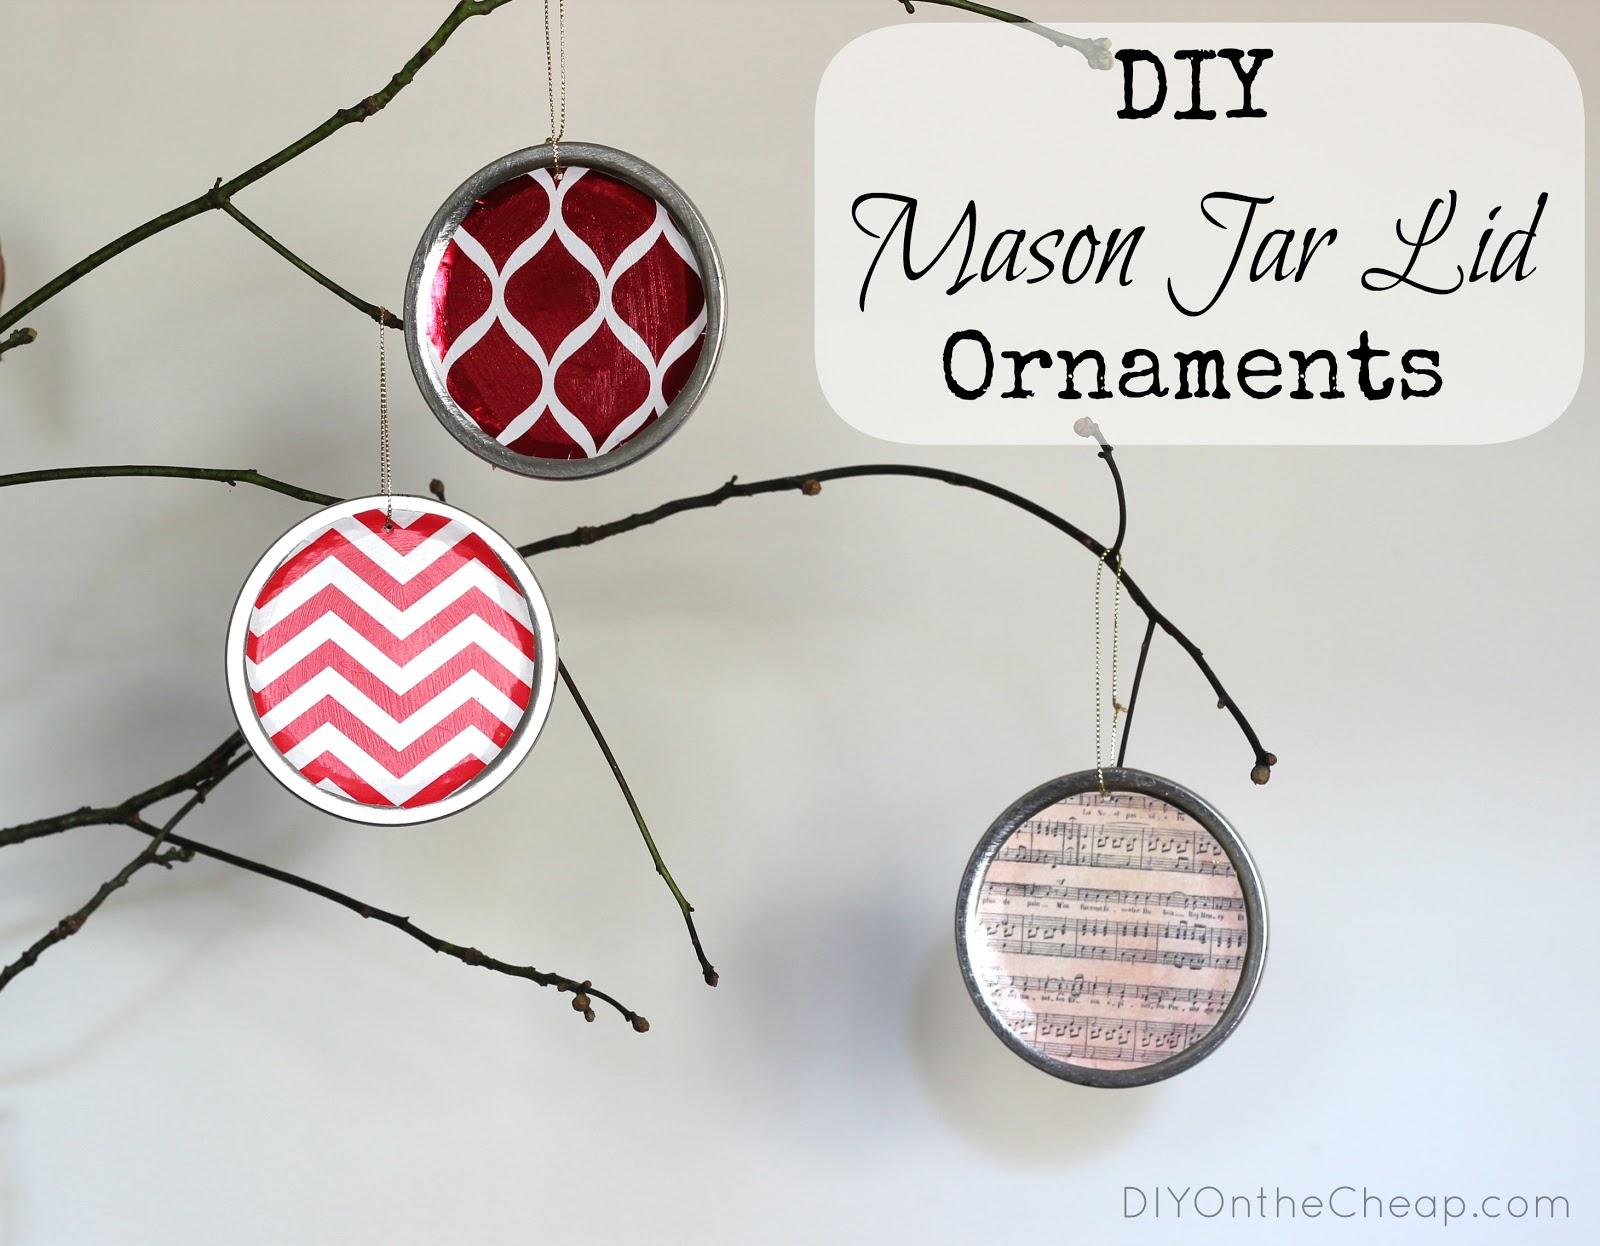 Mason jar ornaments - Diy Mason Jar Lid Ornaments Erin Spain